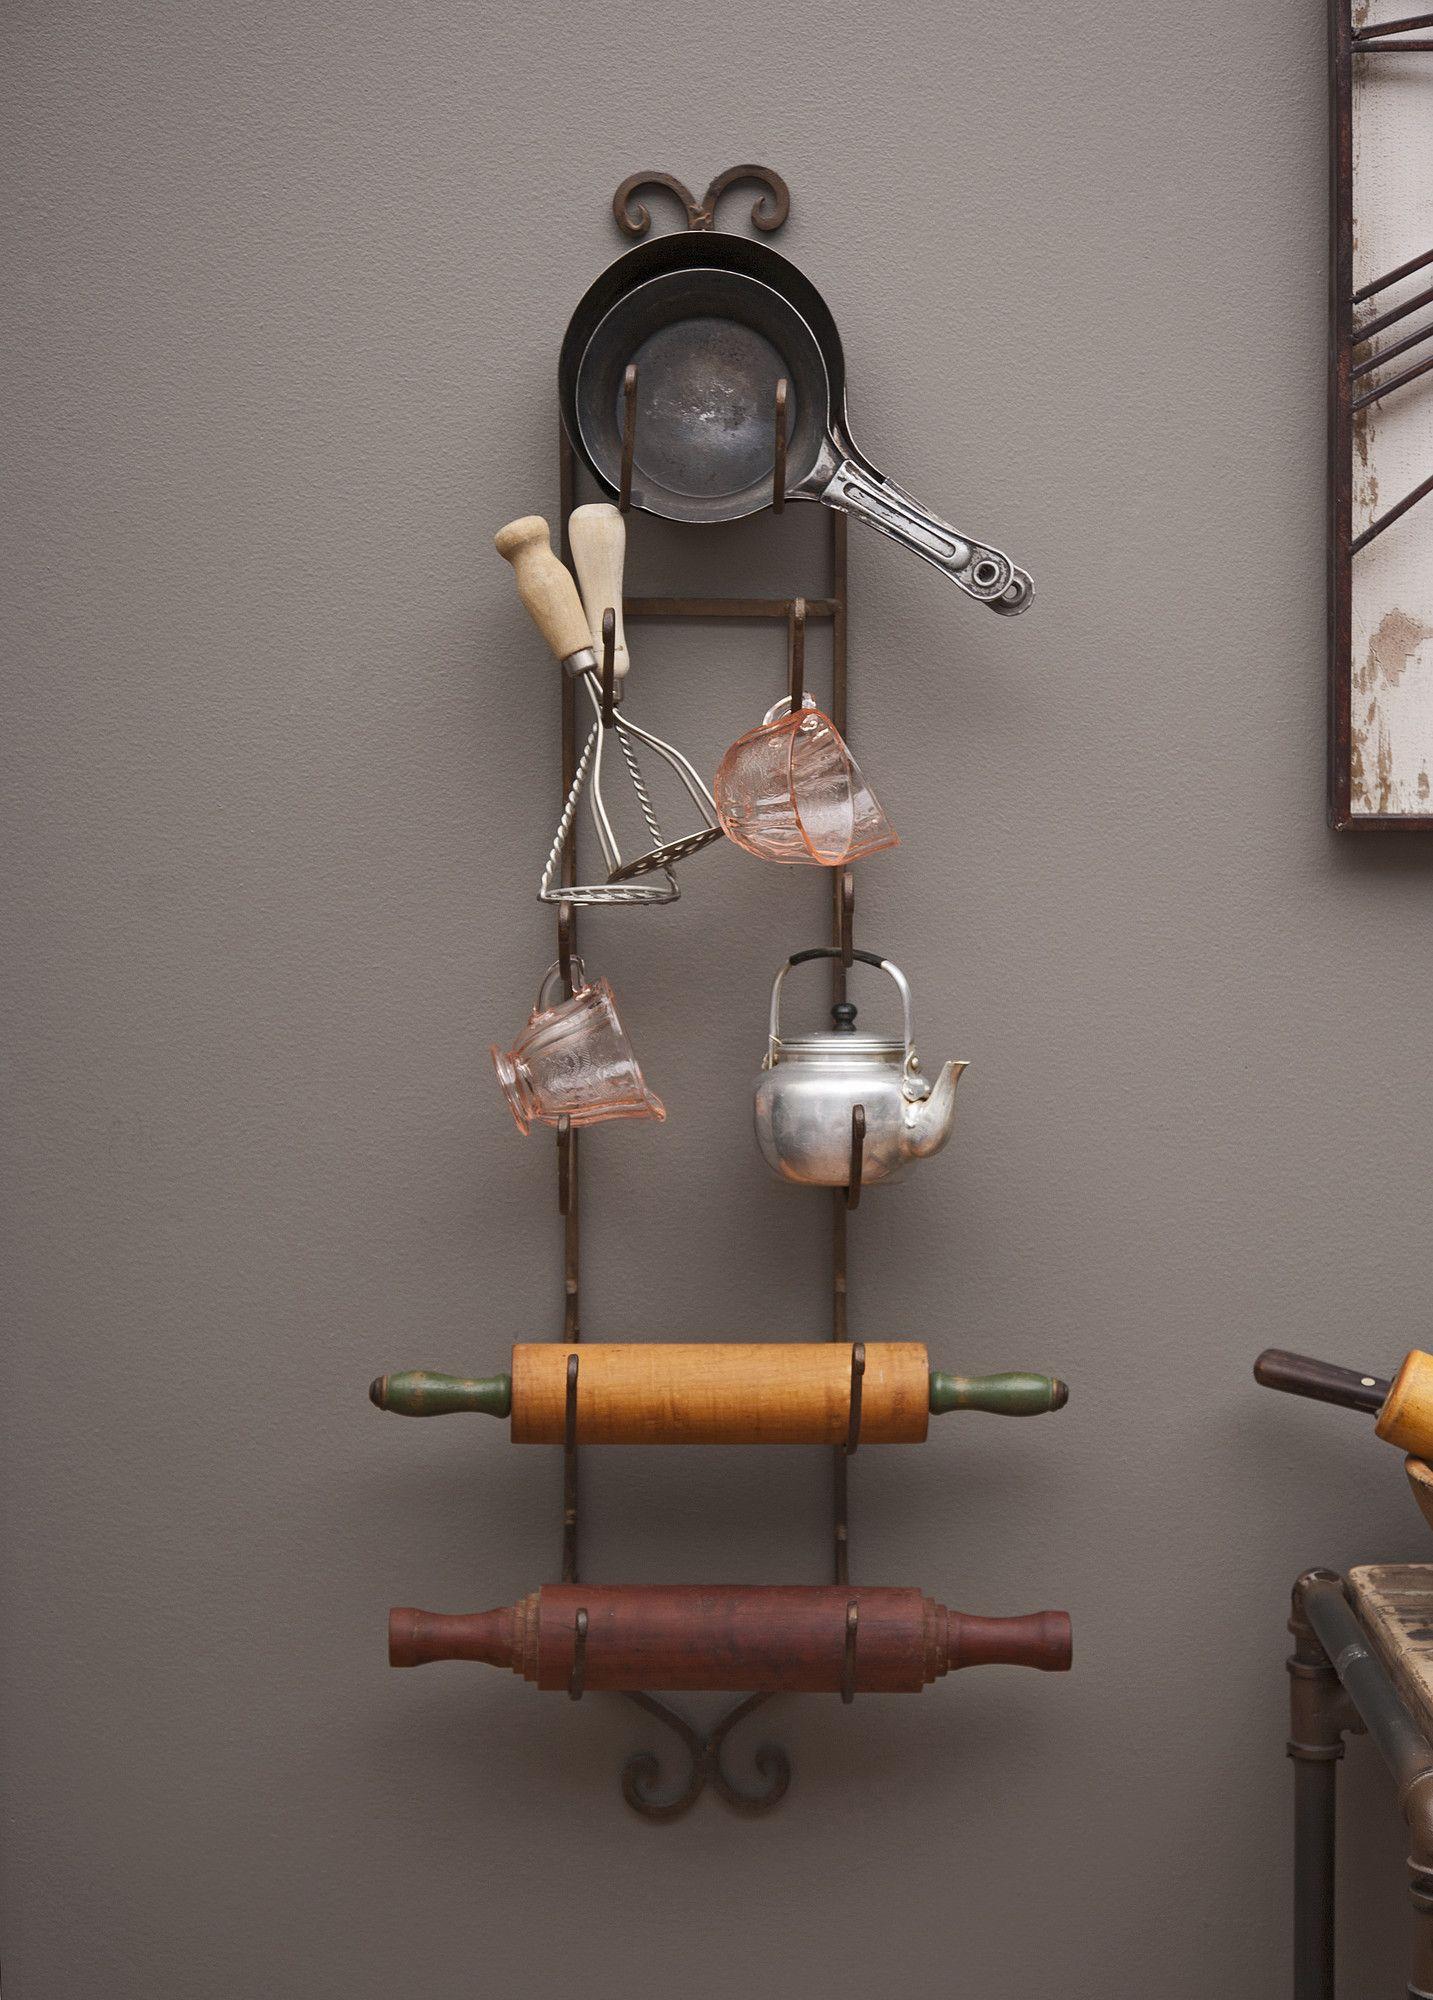 Rustic Iron Wall Rack